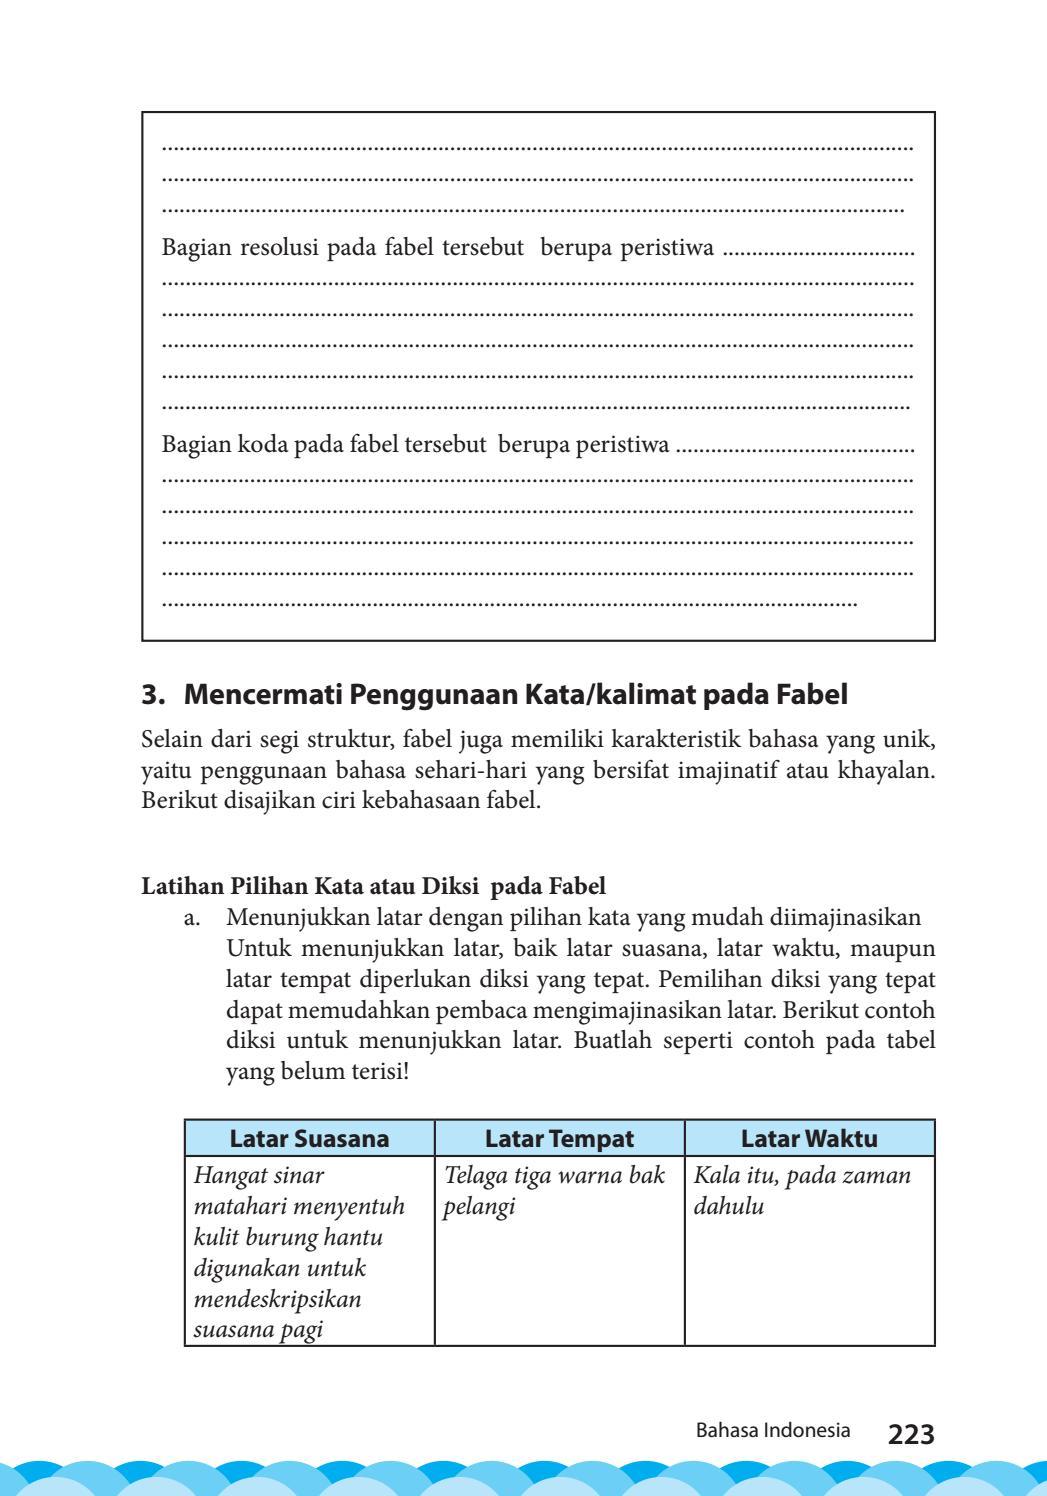 Contoh Latar Tempat : contoh, latar, tempat, Kelas, Bahasa, Indonesia, Siswa, GALLERY, AZZAM, Issuu